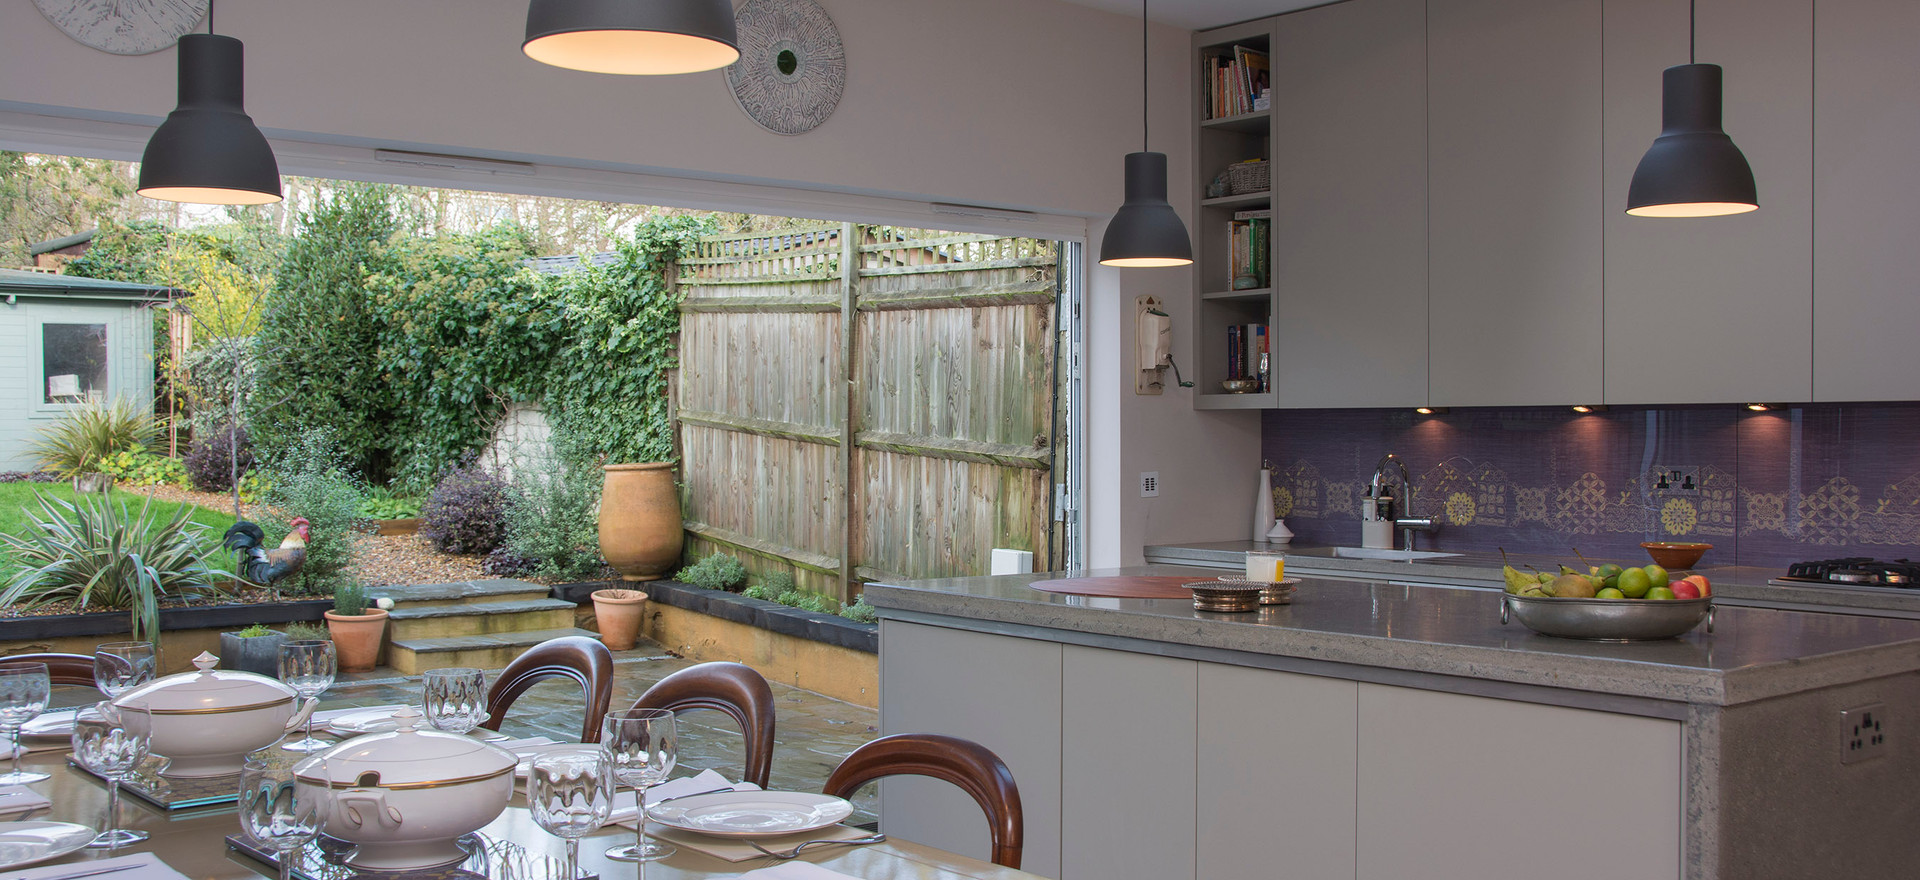 Swains-Lane-N6-Kitchen2.jpg